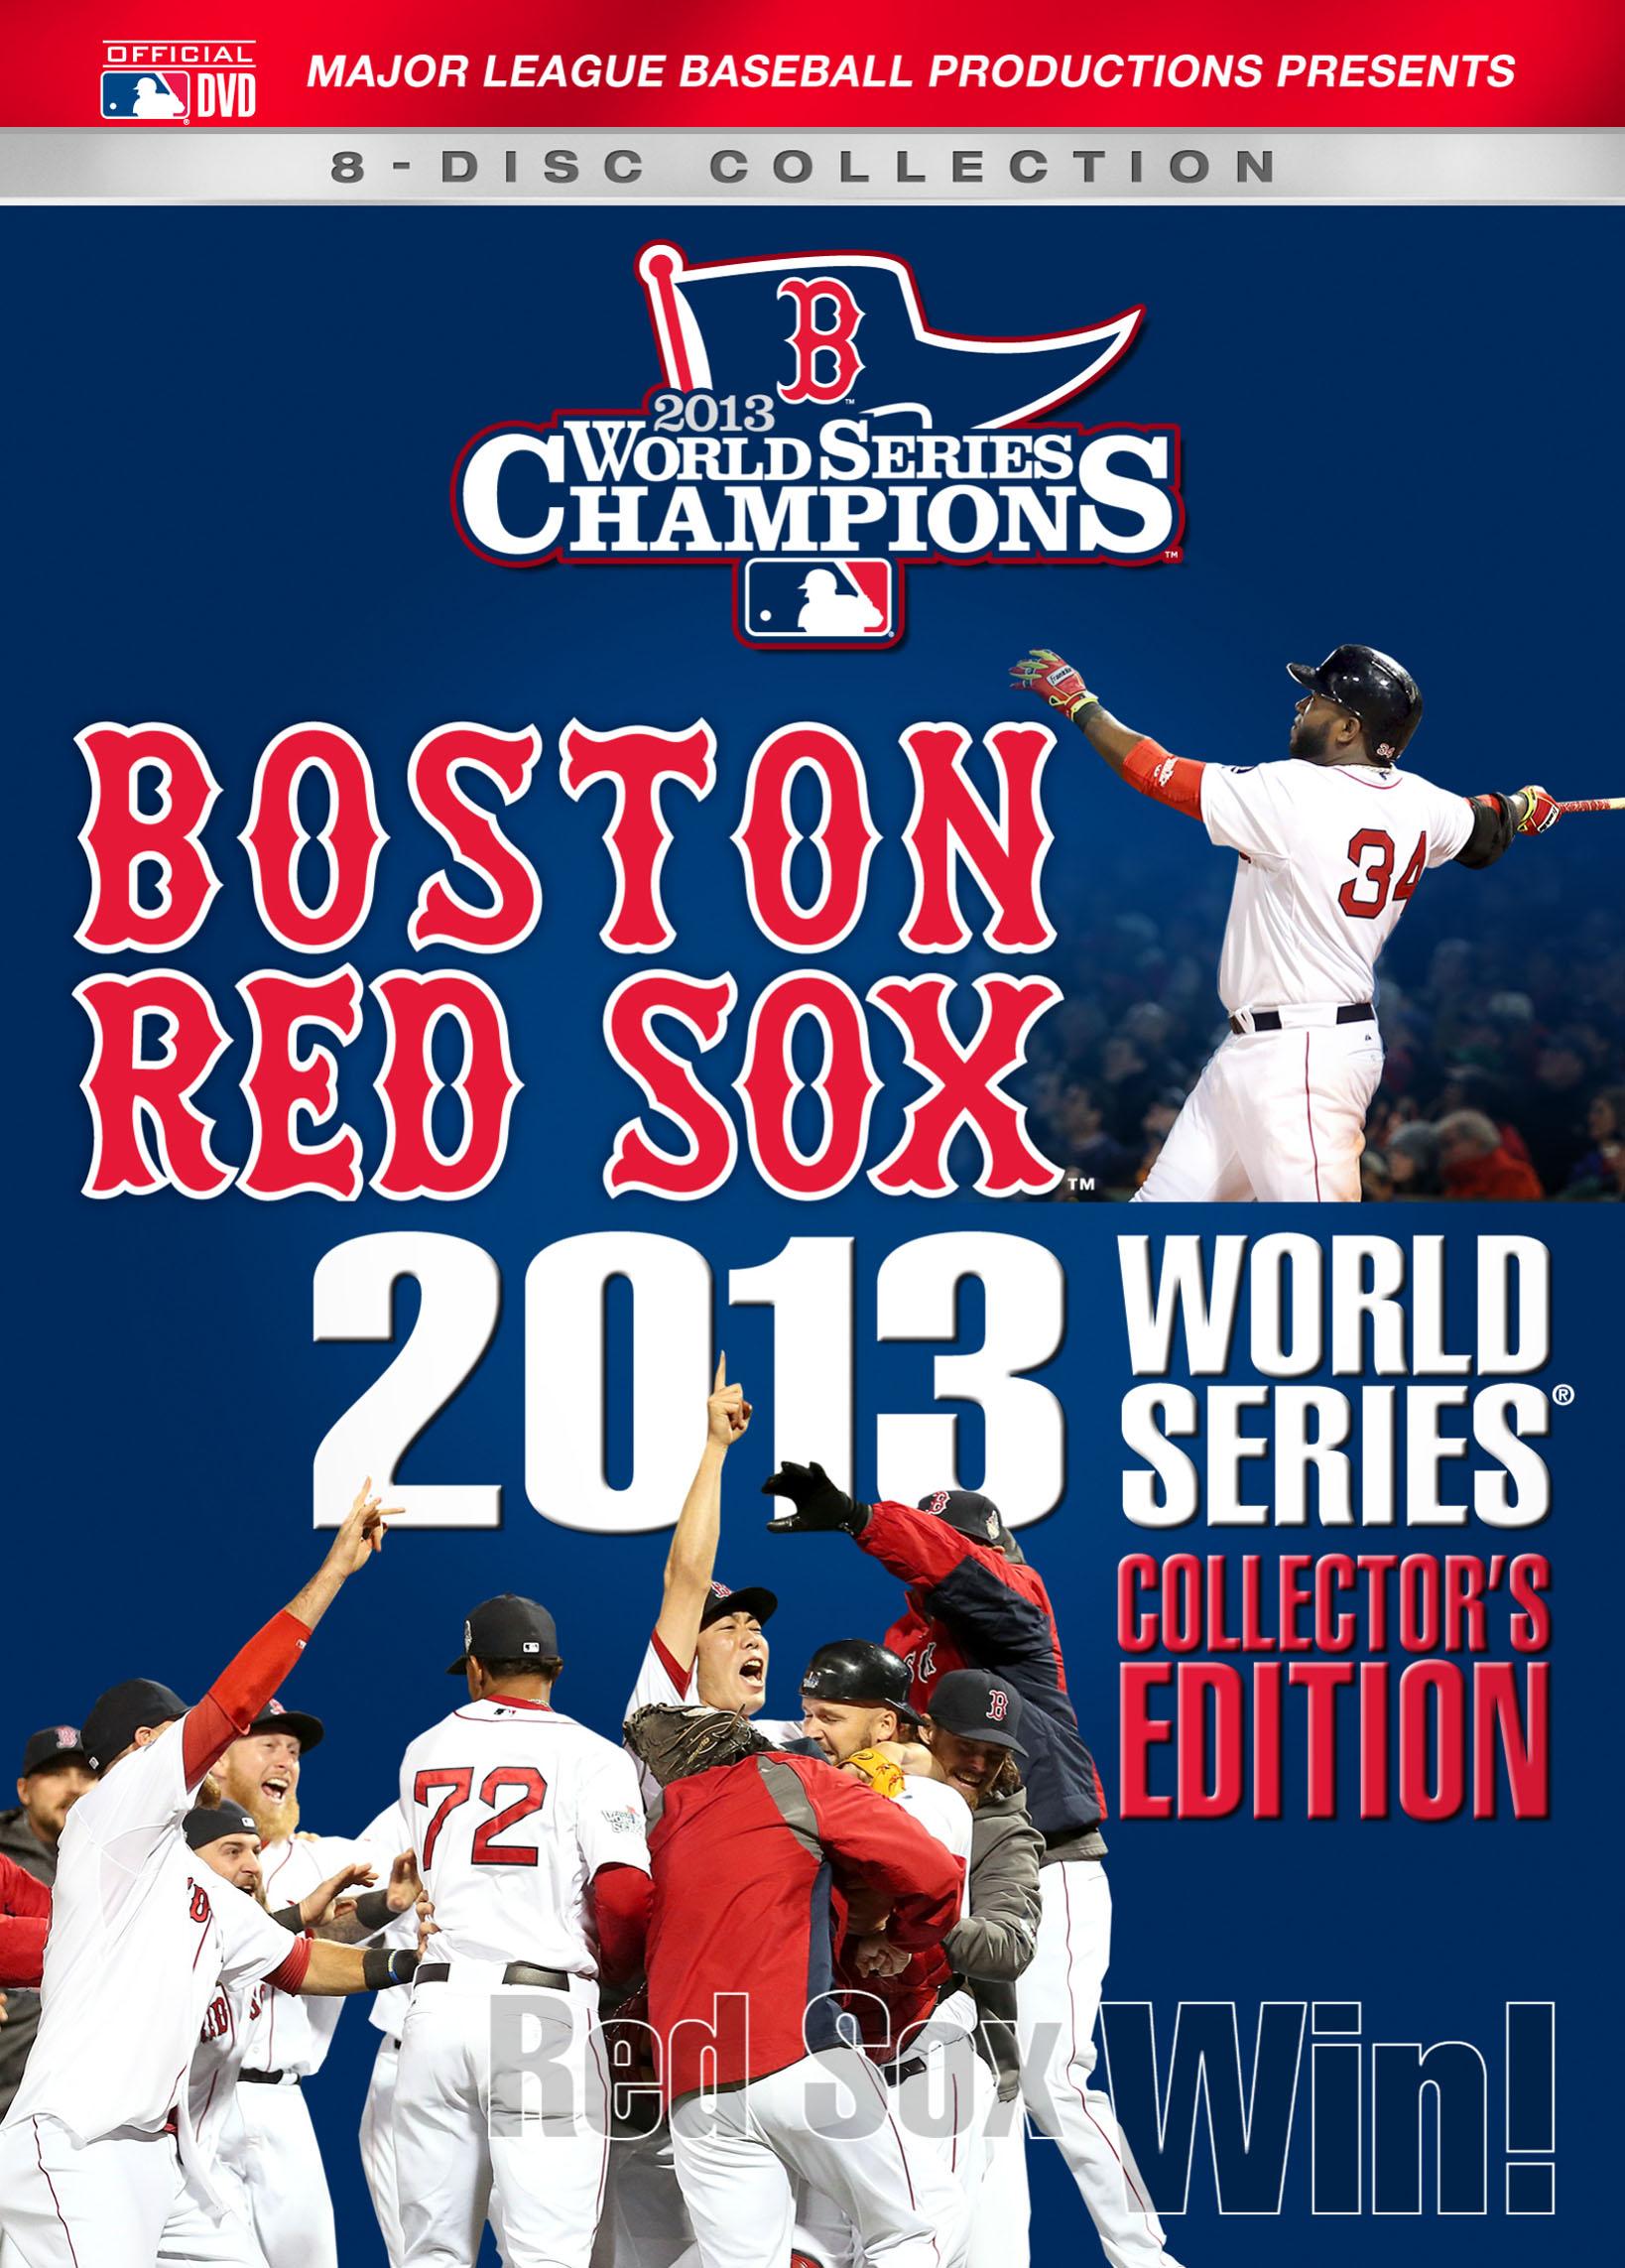 MLB: 2013 World Series Collector's Edition